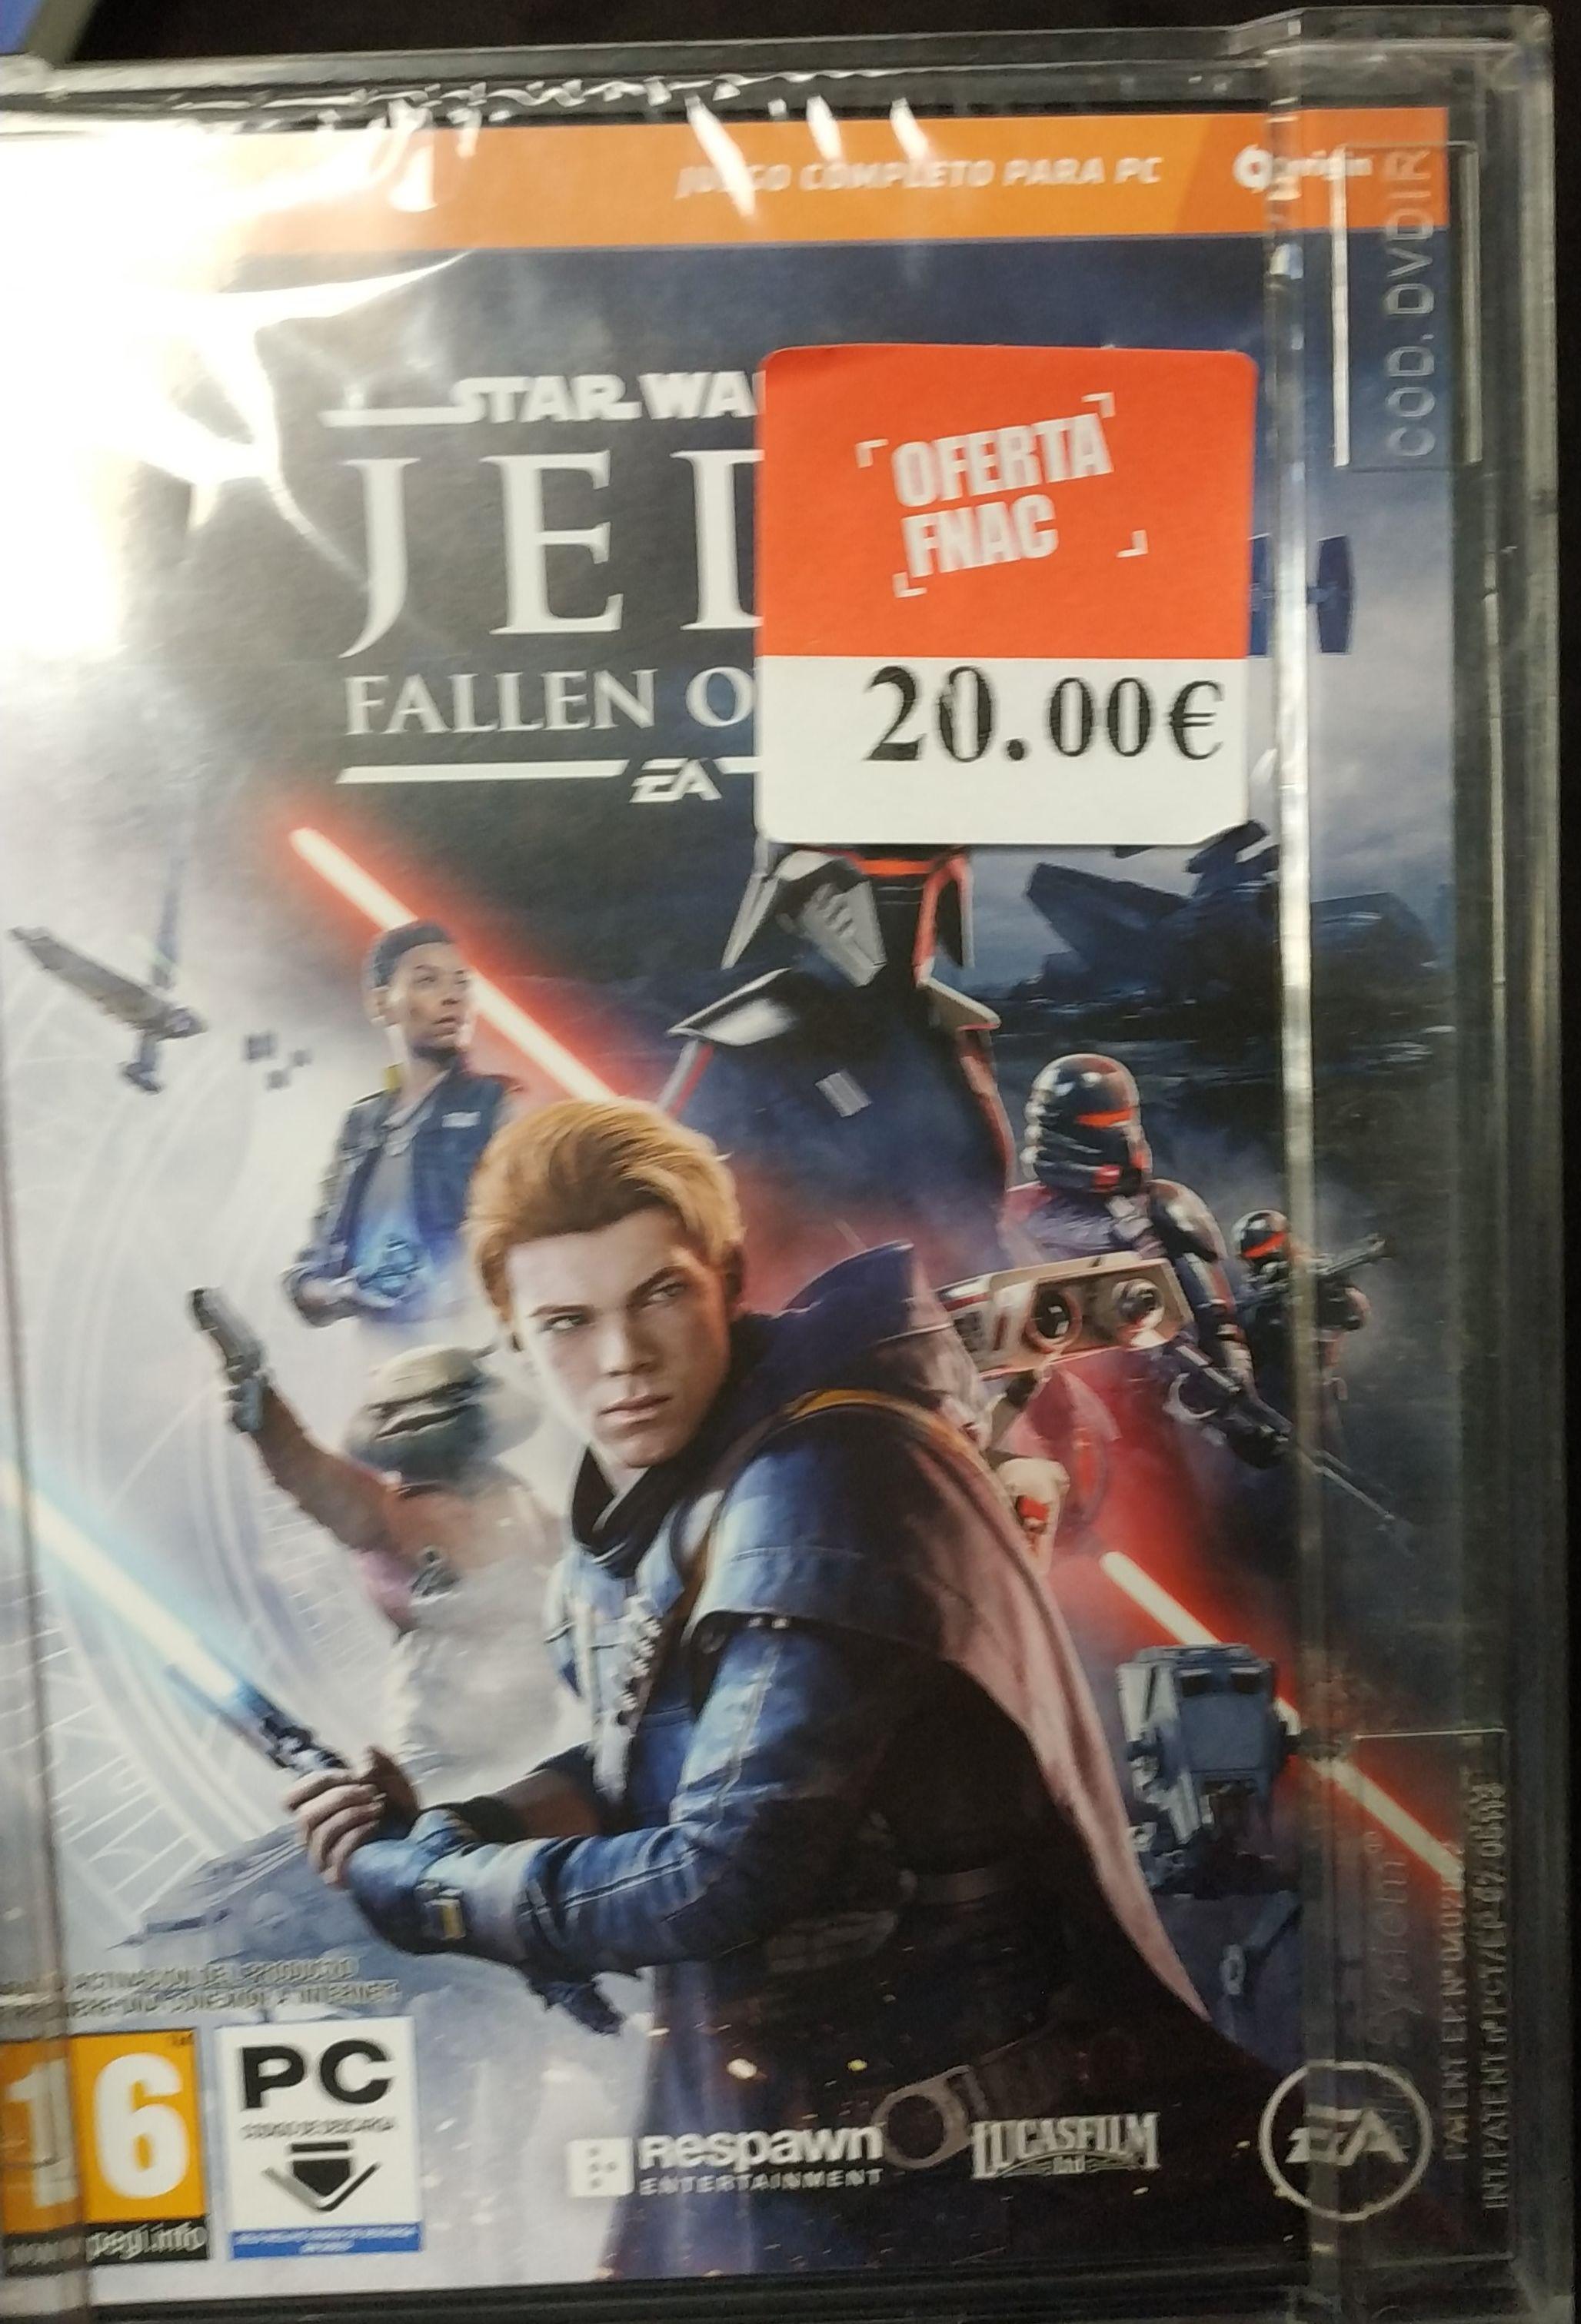 Star Wars Jedi fallen order * Fnac marbella*